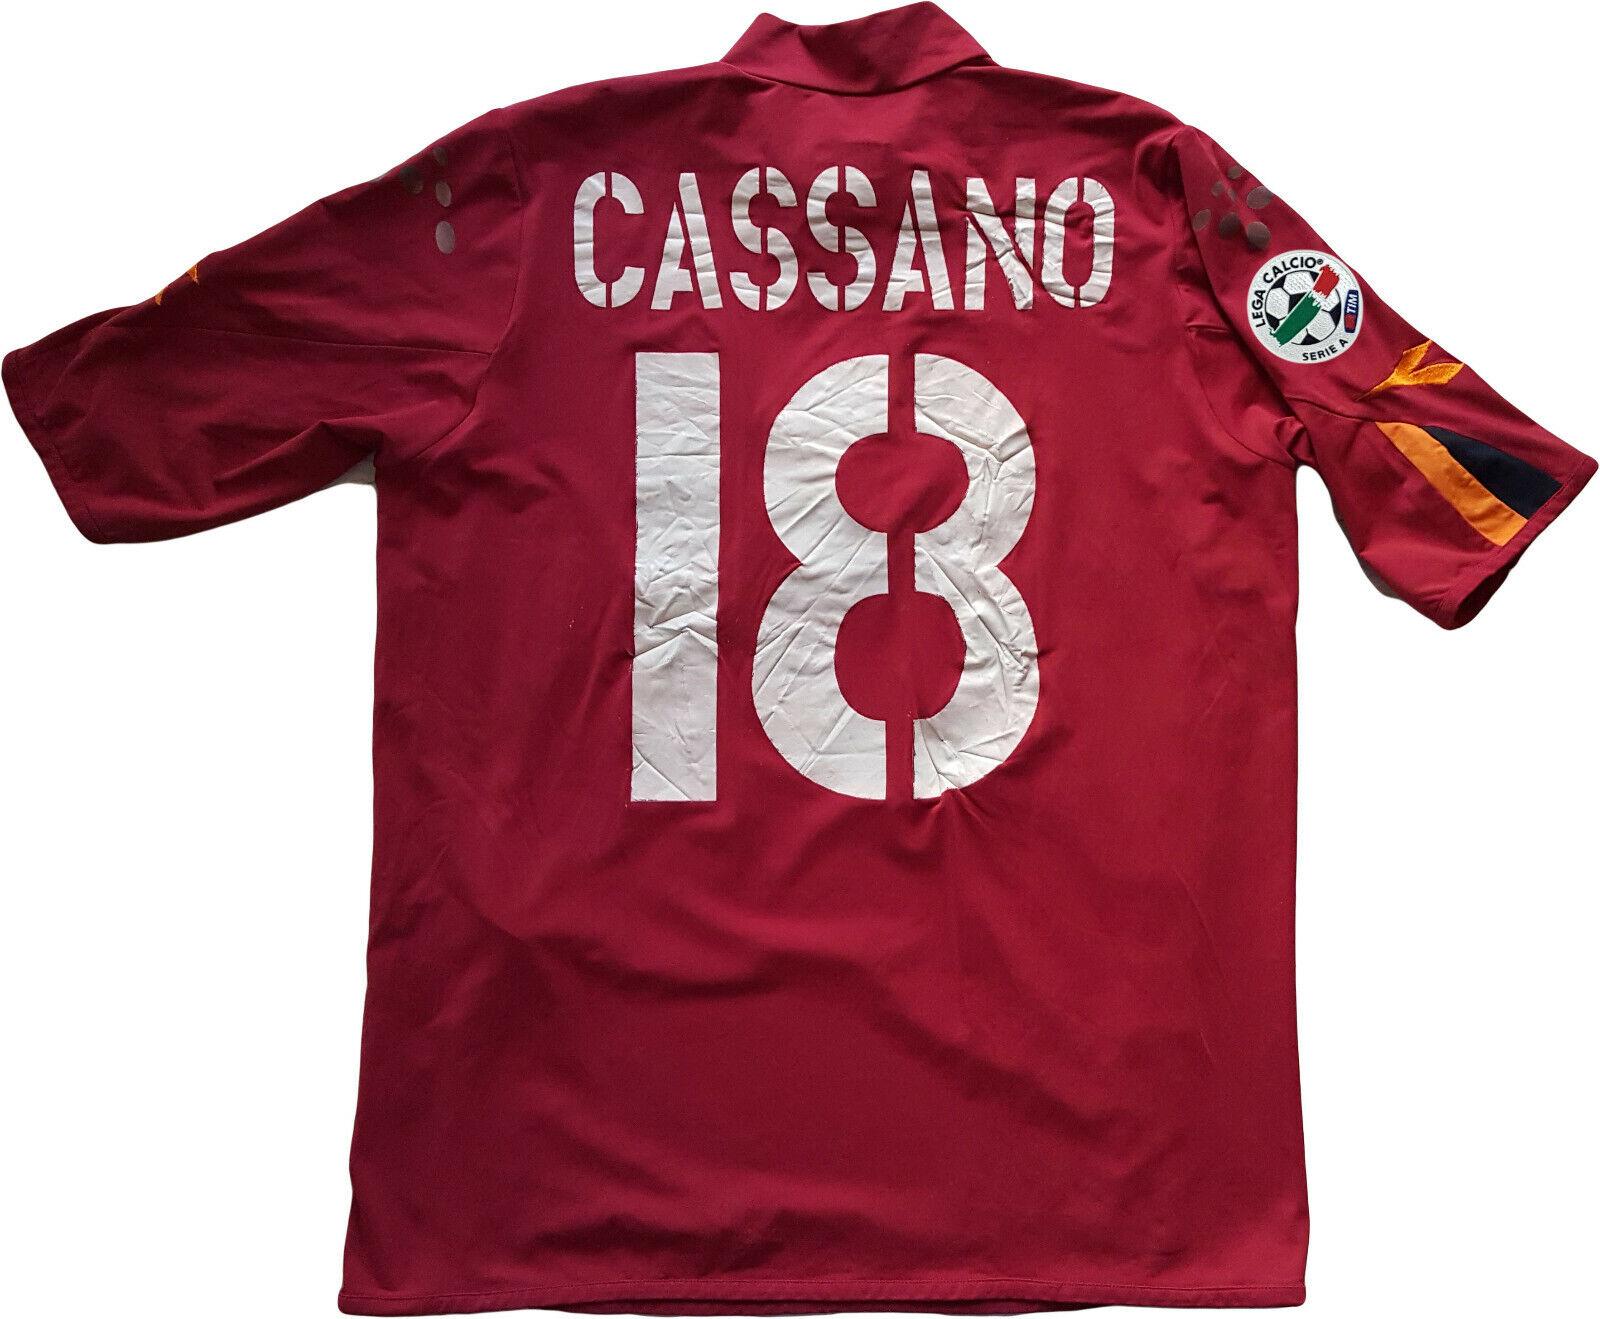 Cassano Roma home jersey 2004 2005 DIADORA L jersey as roma